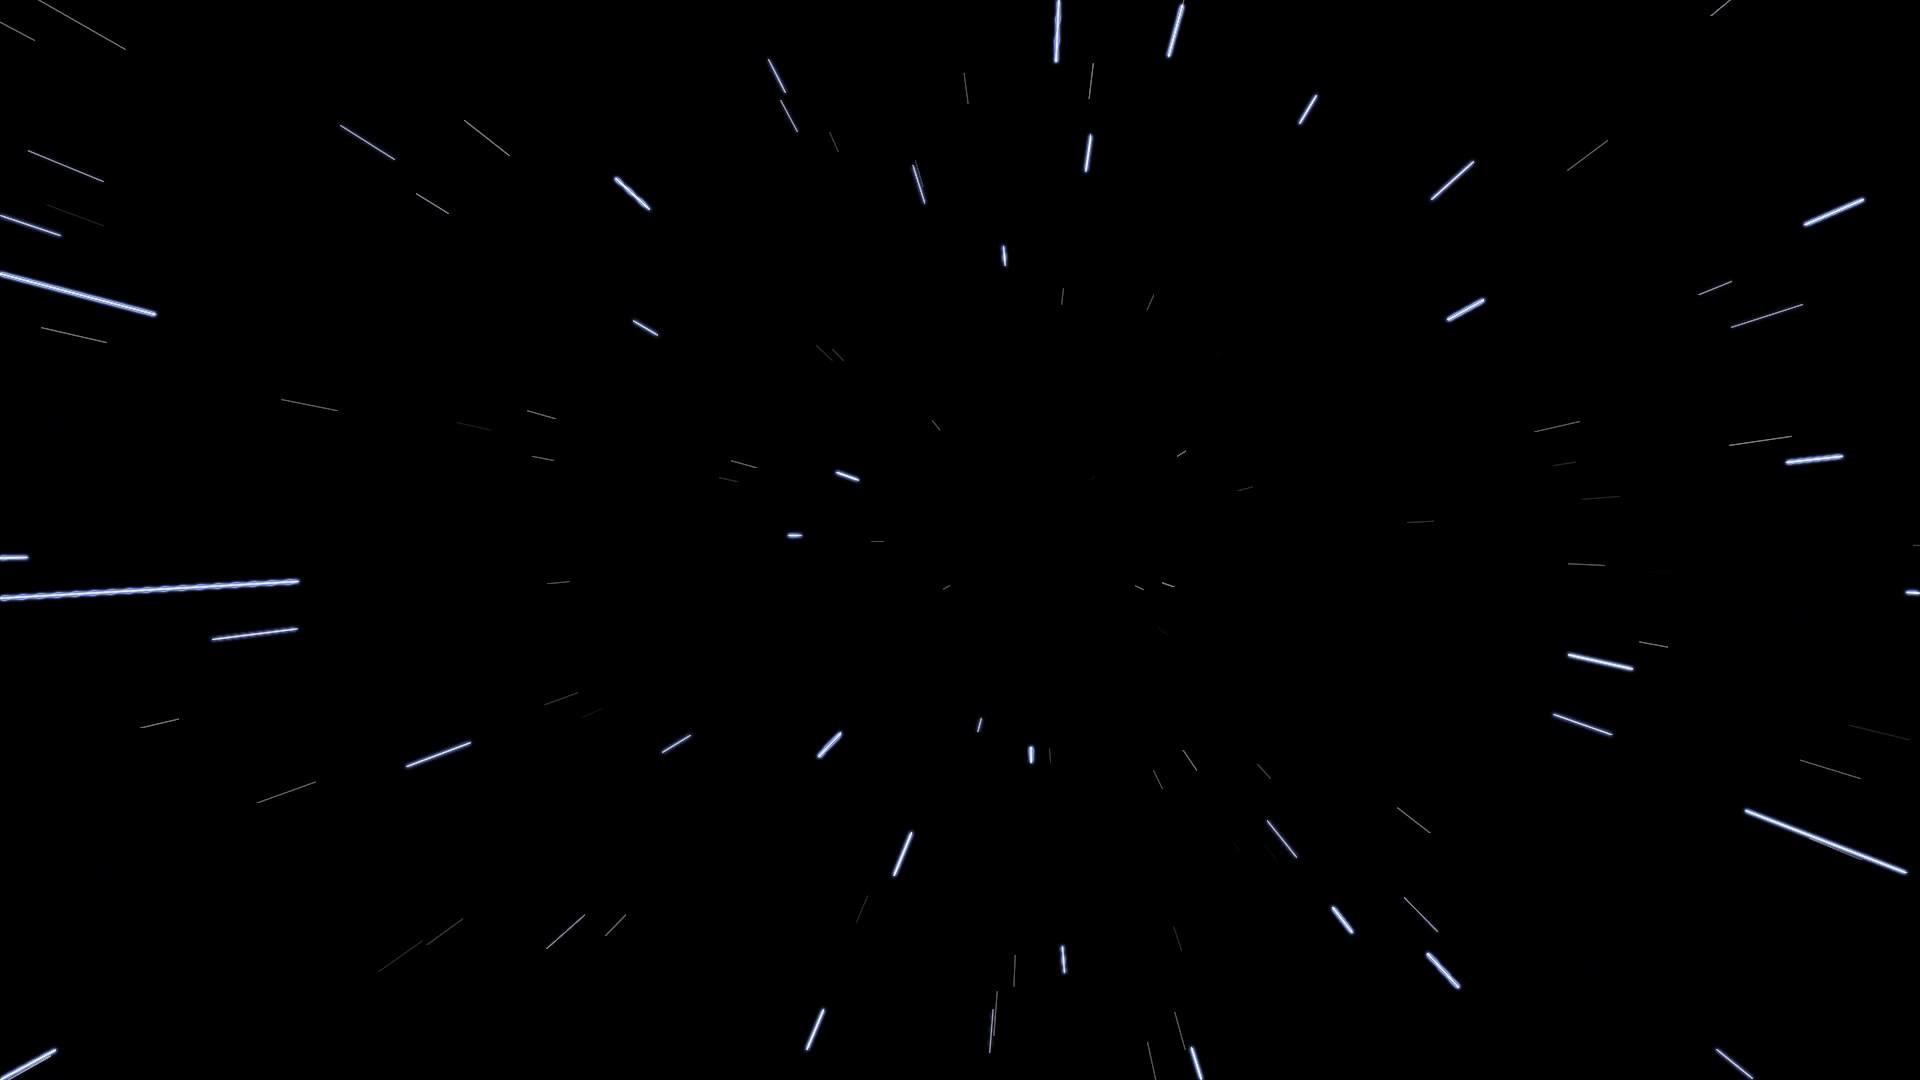 Dark Star Wars Wallpaper Posted By Ryan Anderson